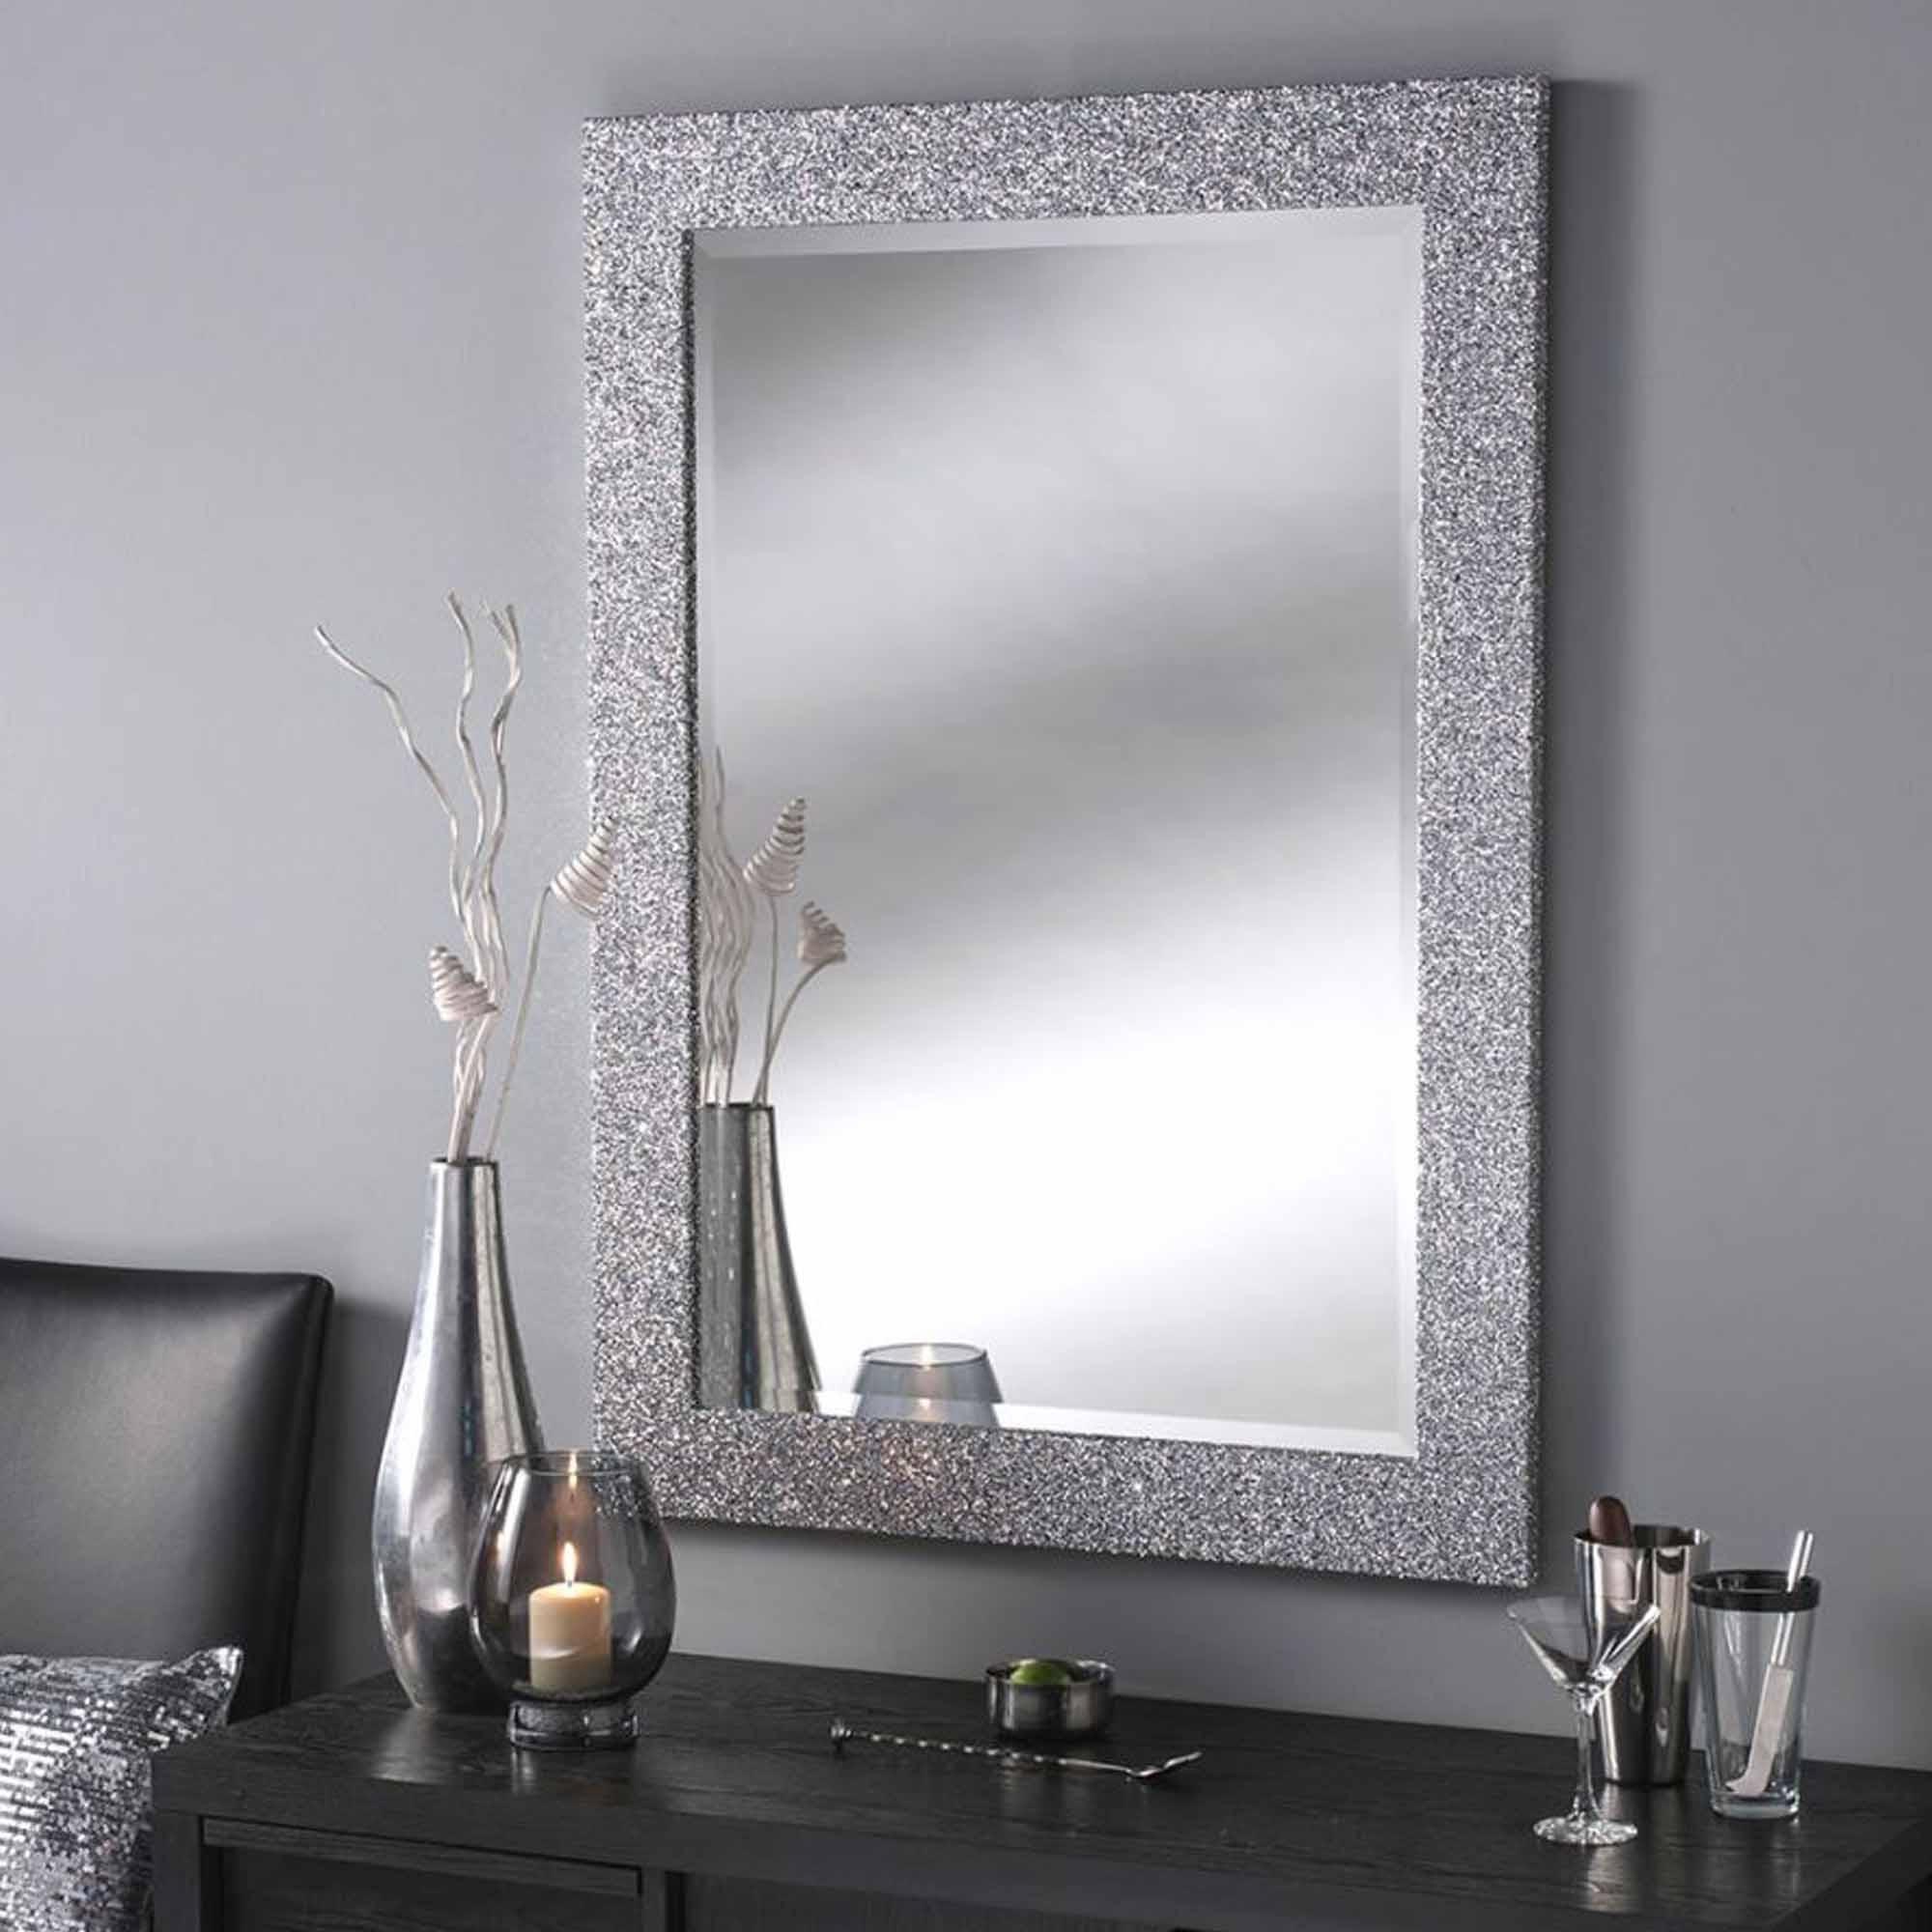 Most Popular Glitter Wall Mirrors Regarding Silver Glitter Rectangular Wall Mirror (View 3 of 20)